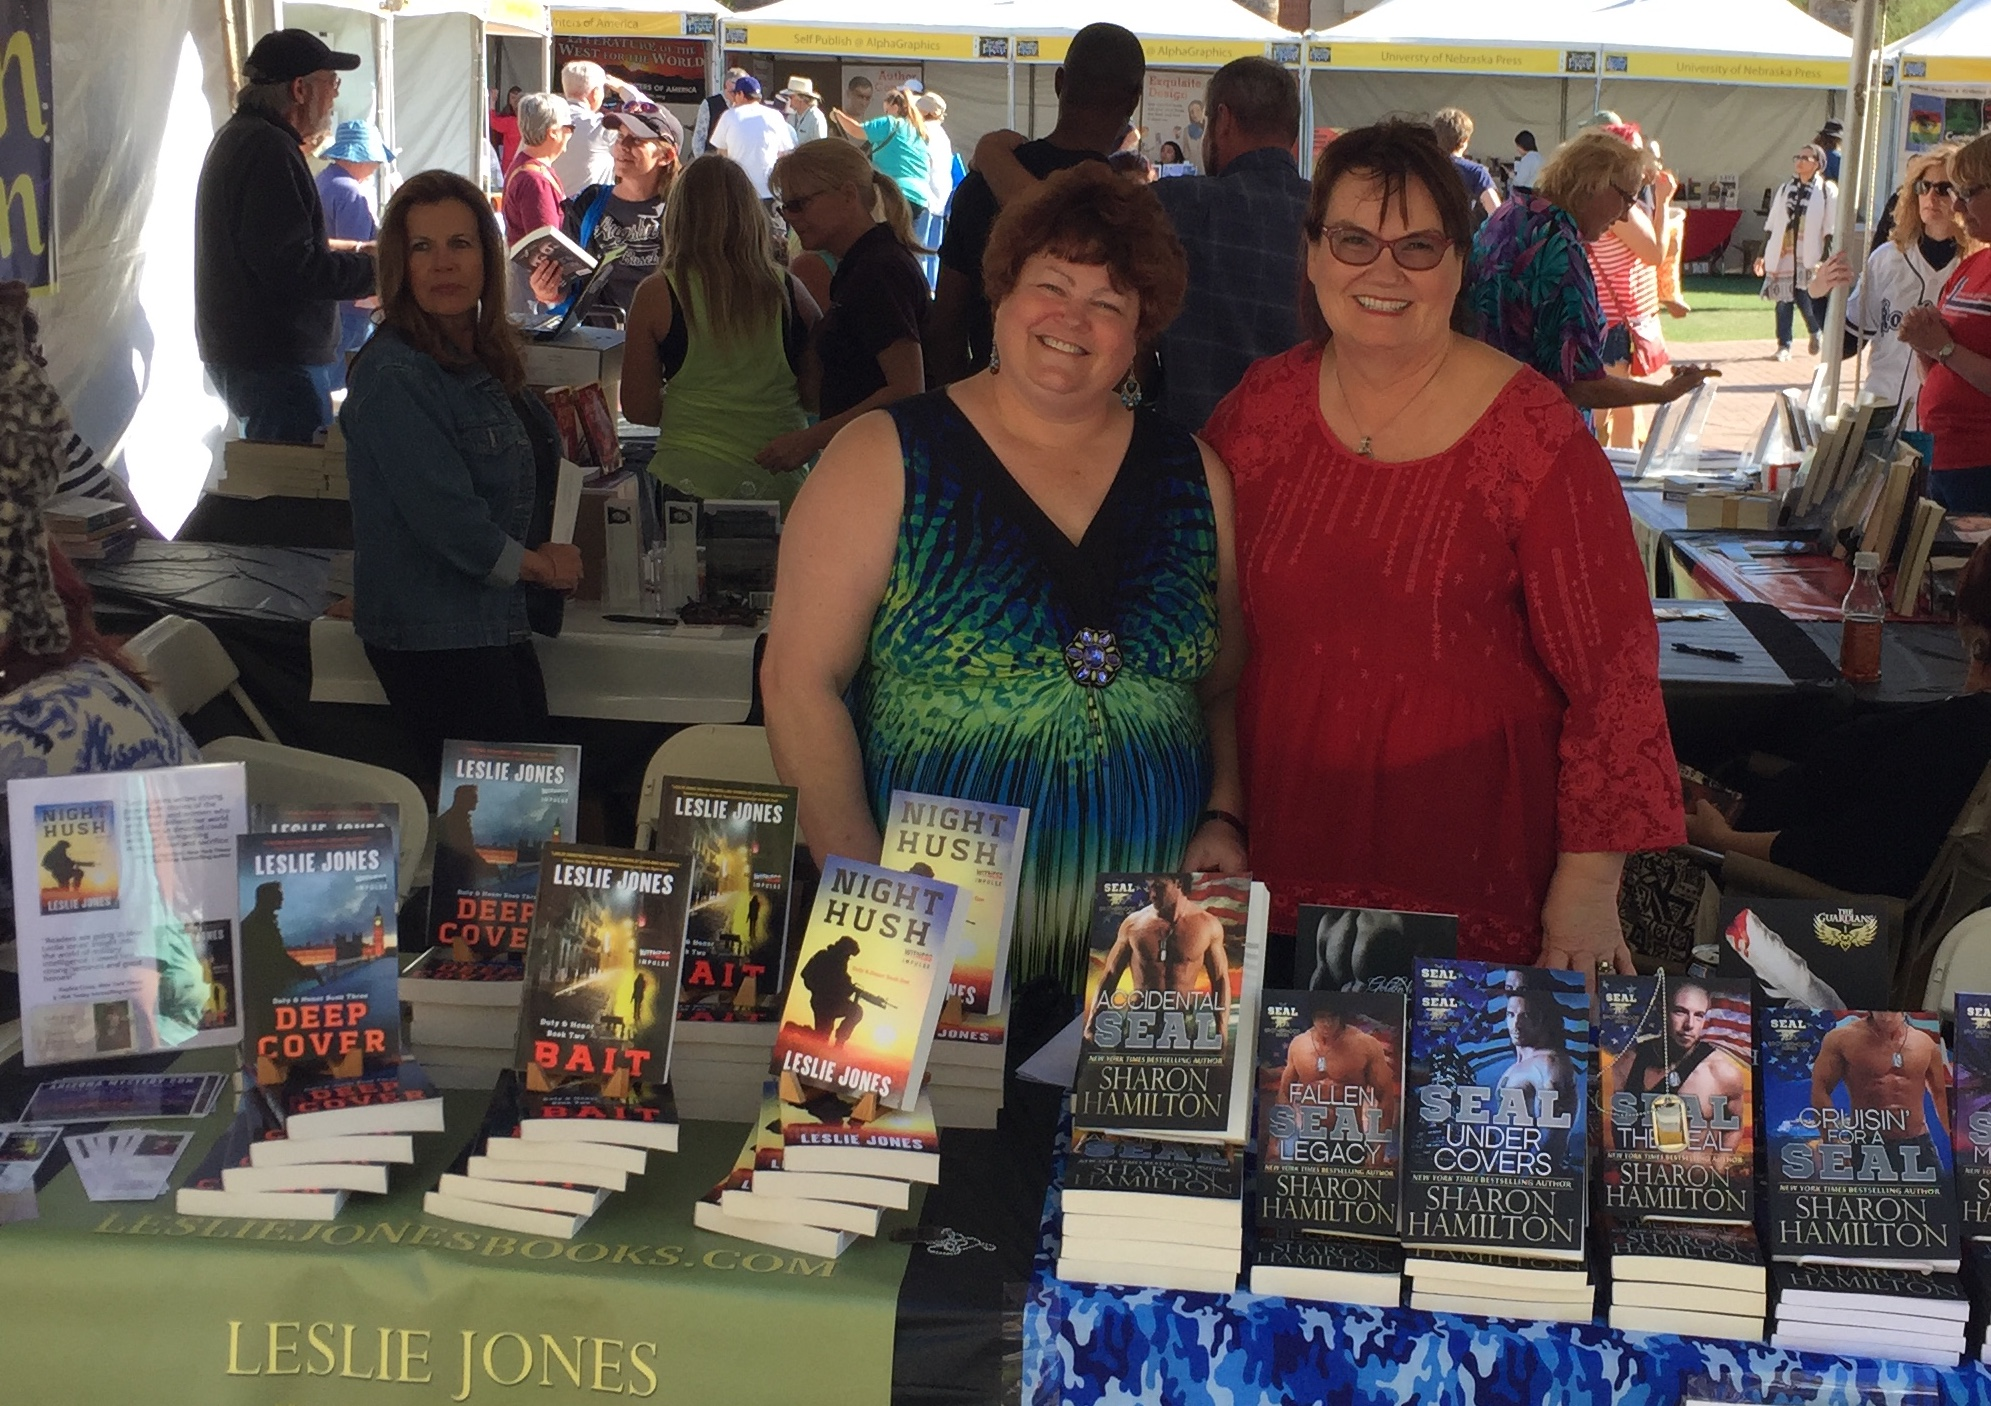 Leslie Jones & Sharon Hamilton at the Tucson Festival of Books